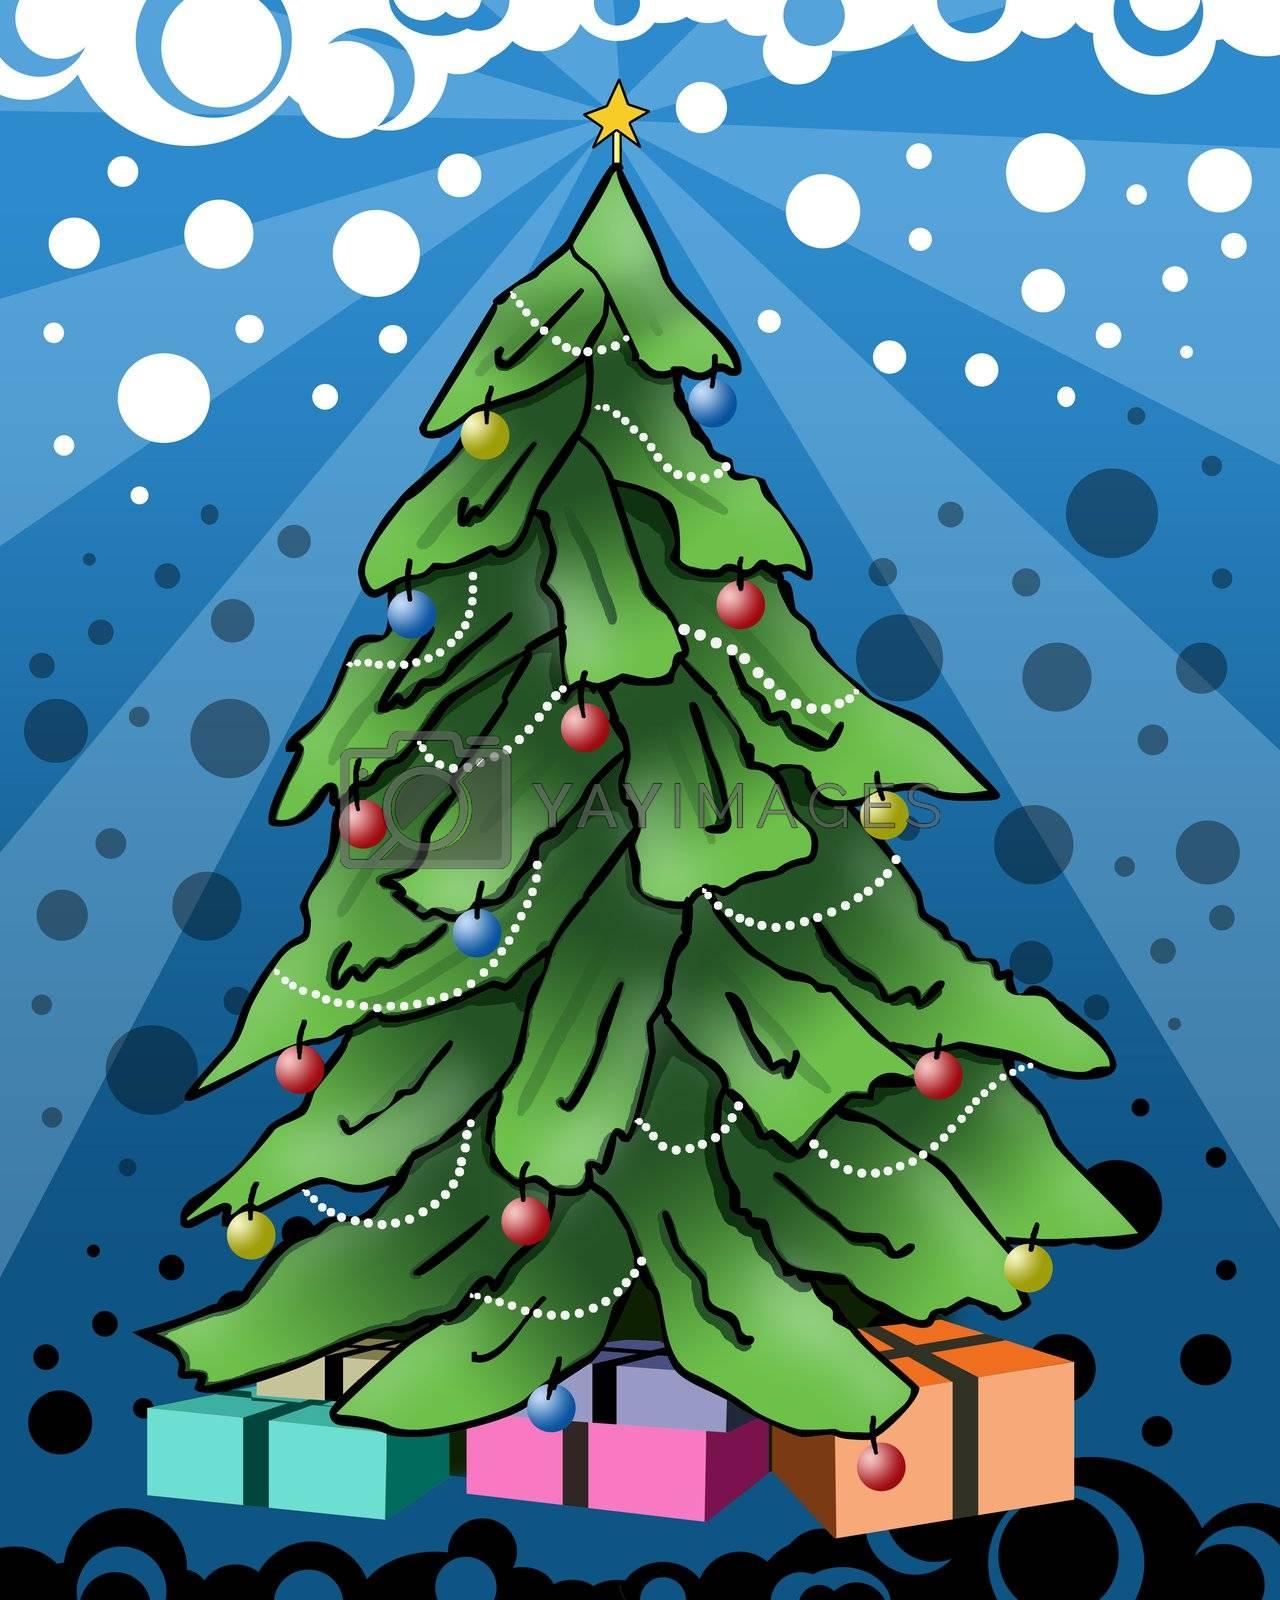 Christmas Tree by 3pod